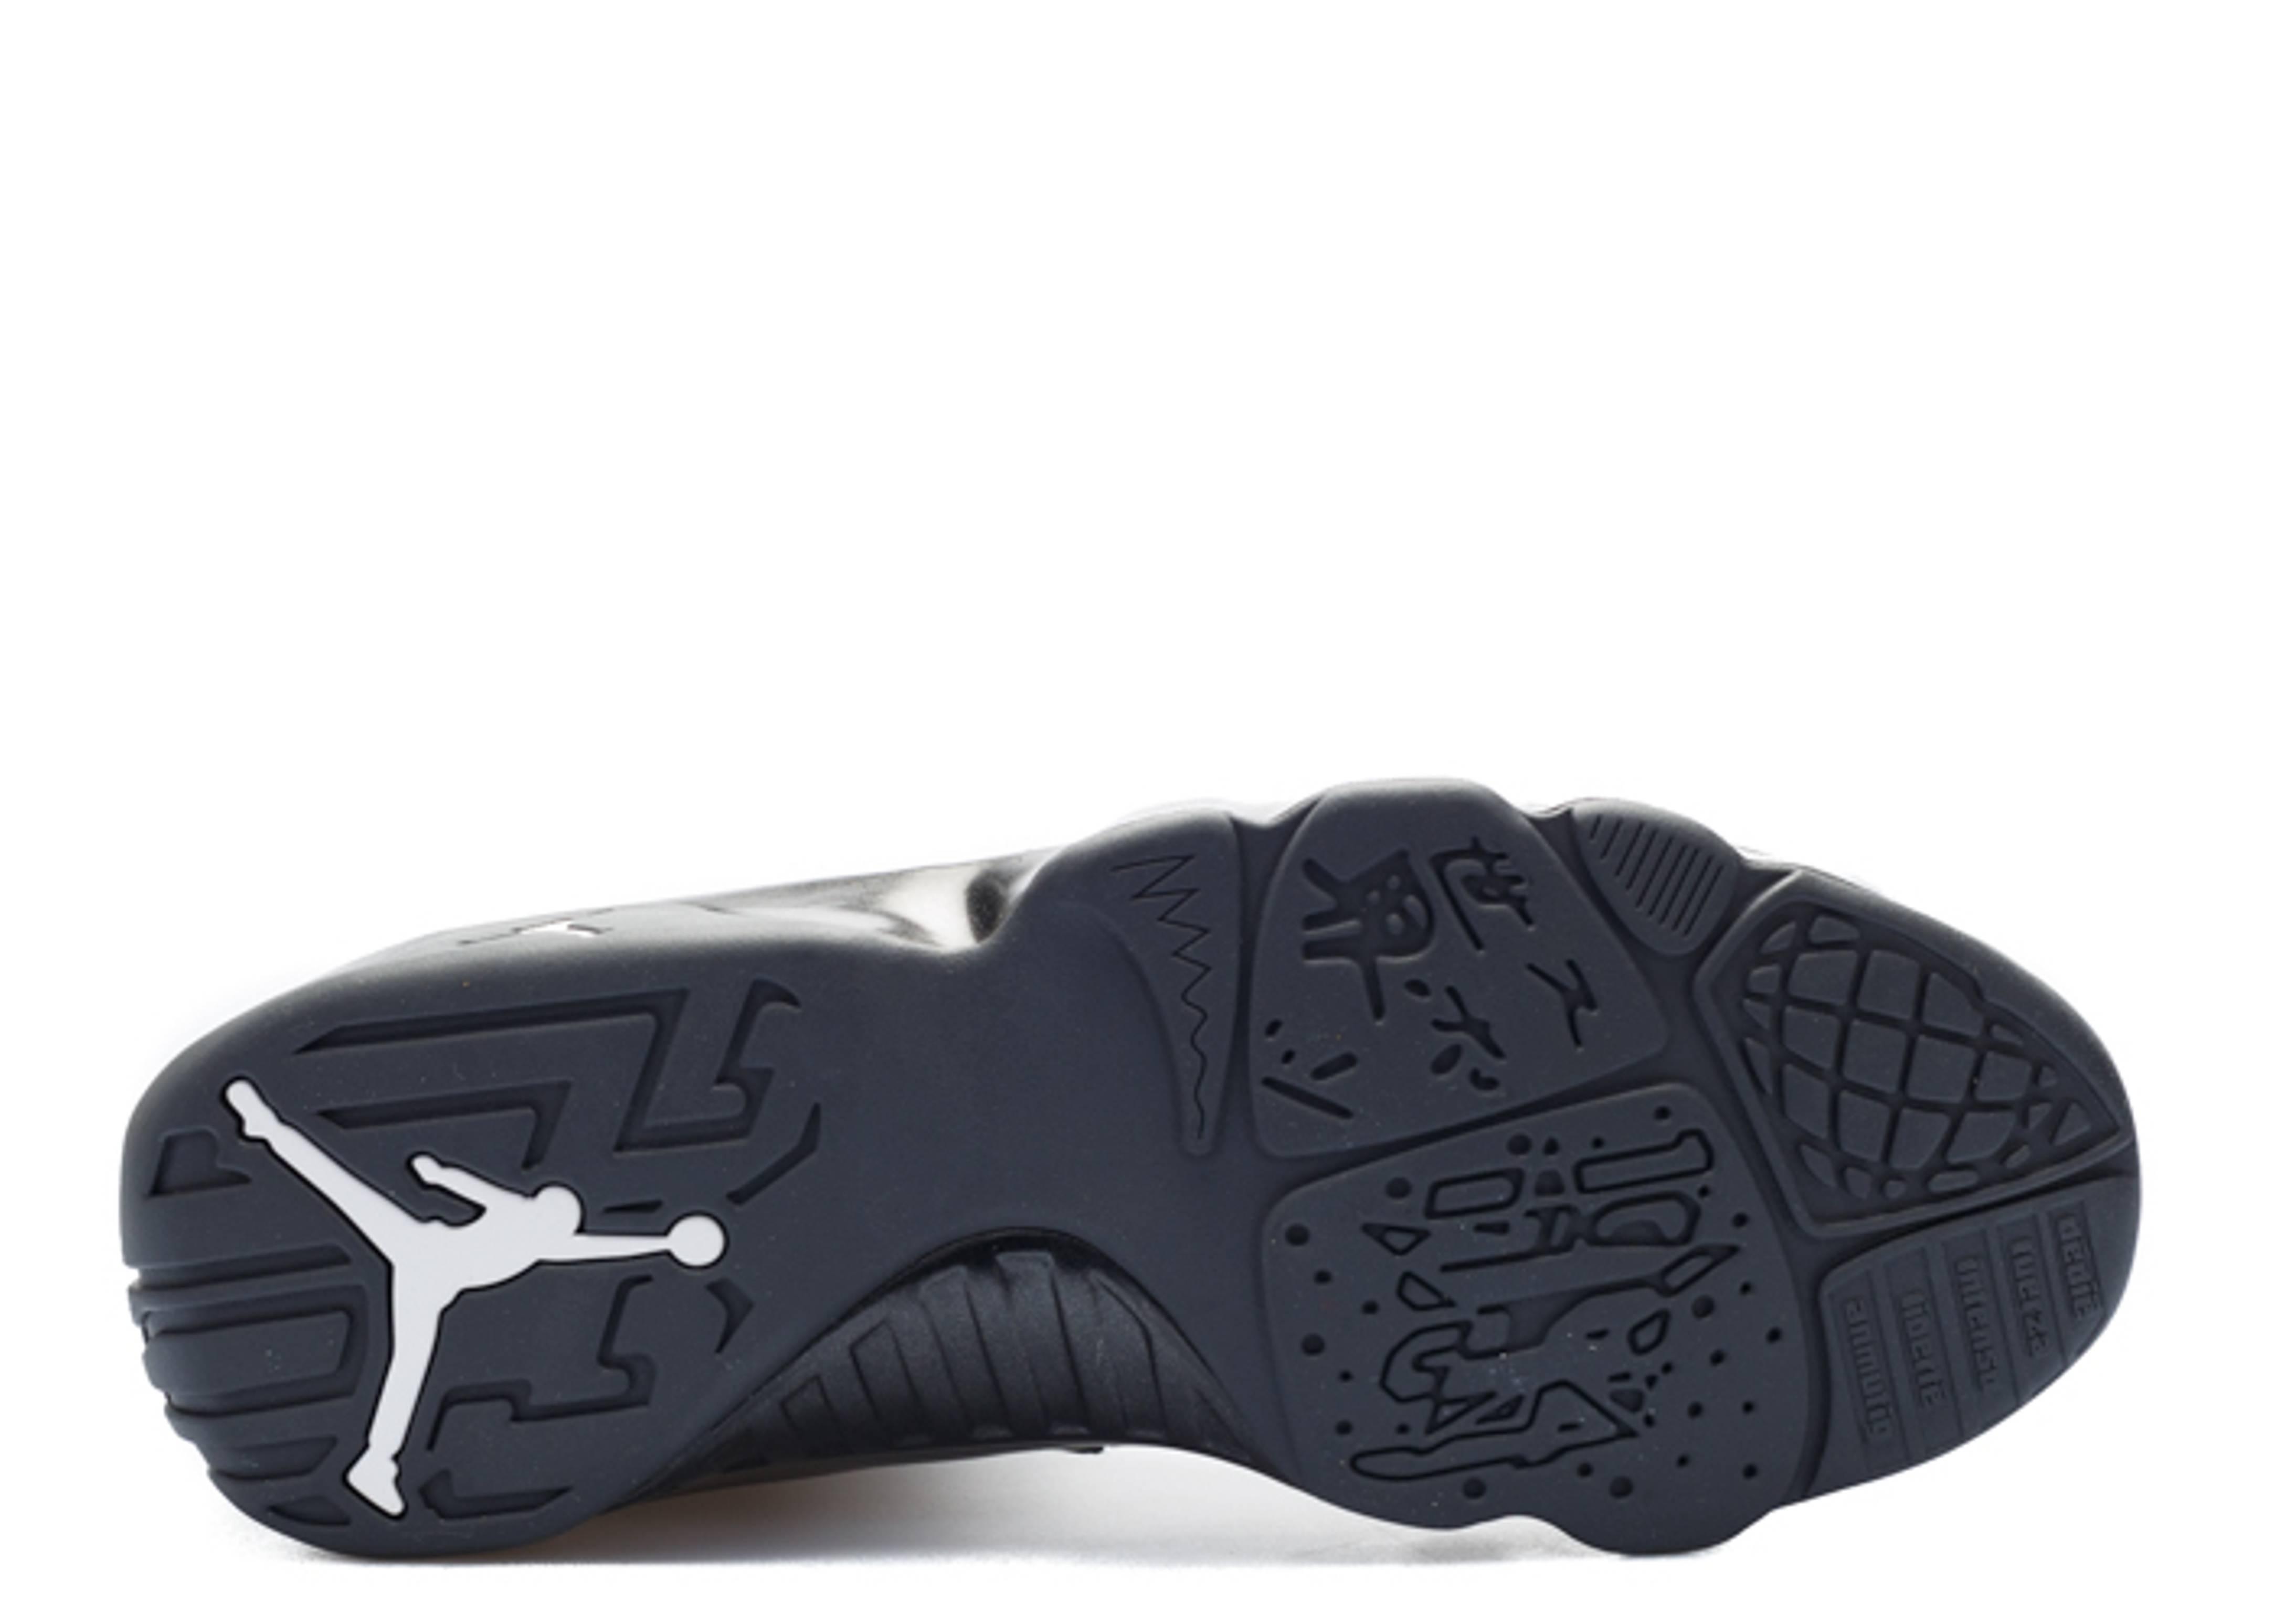 Nike Bruin Mid GS Anthracite Black Black Anthracite 38